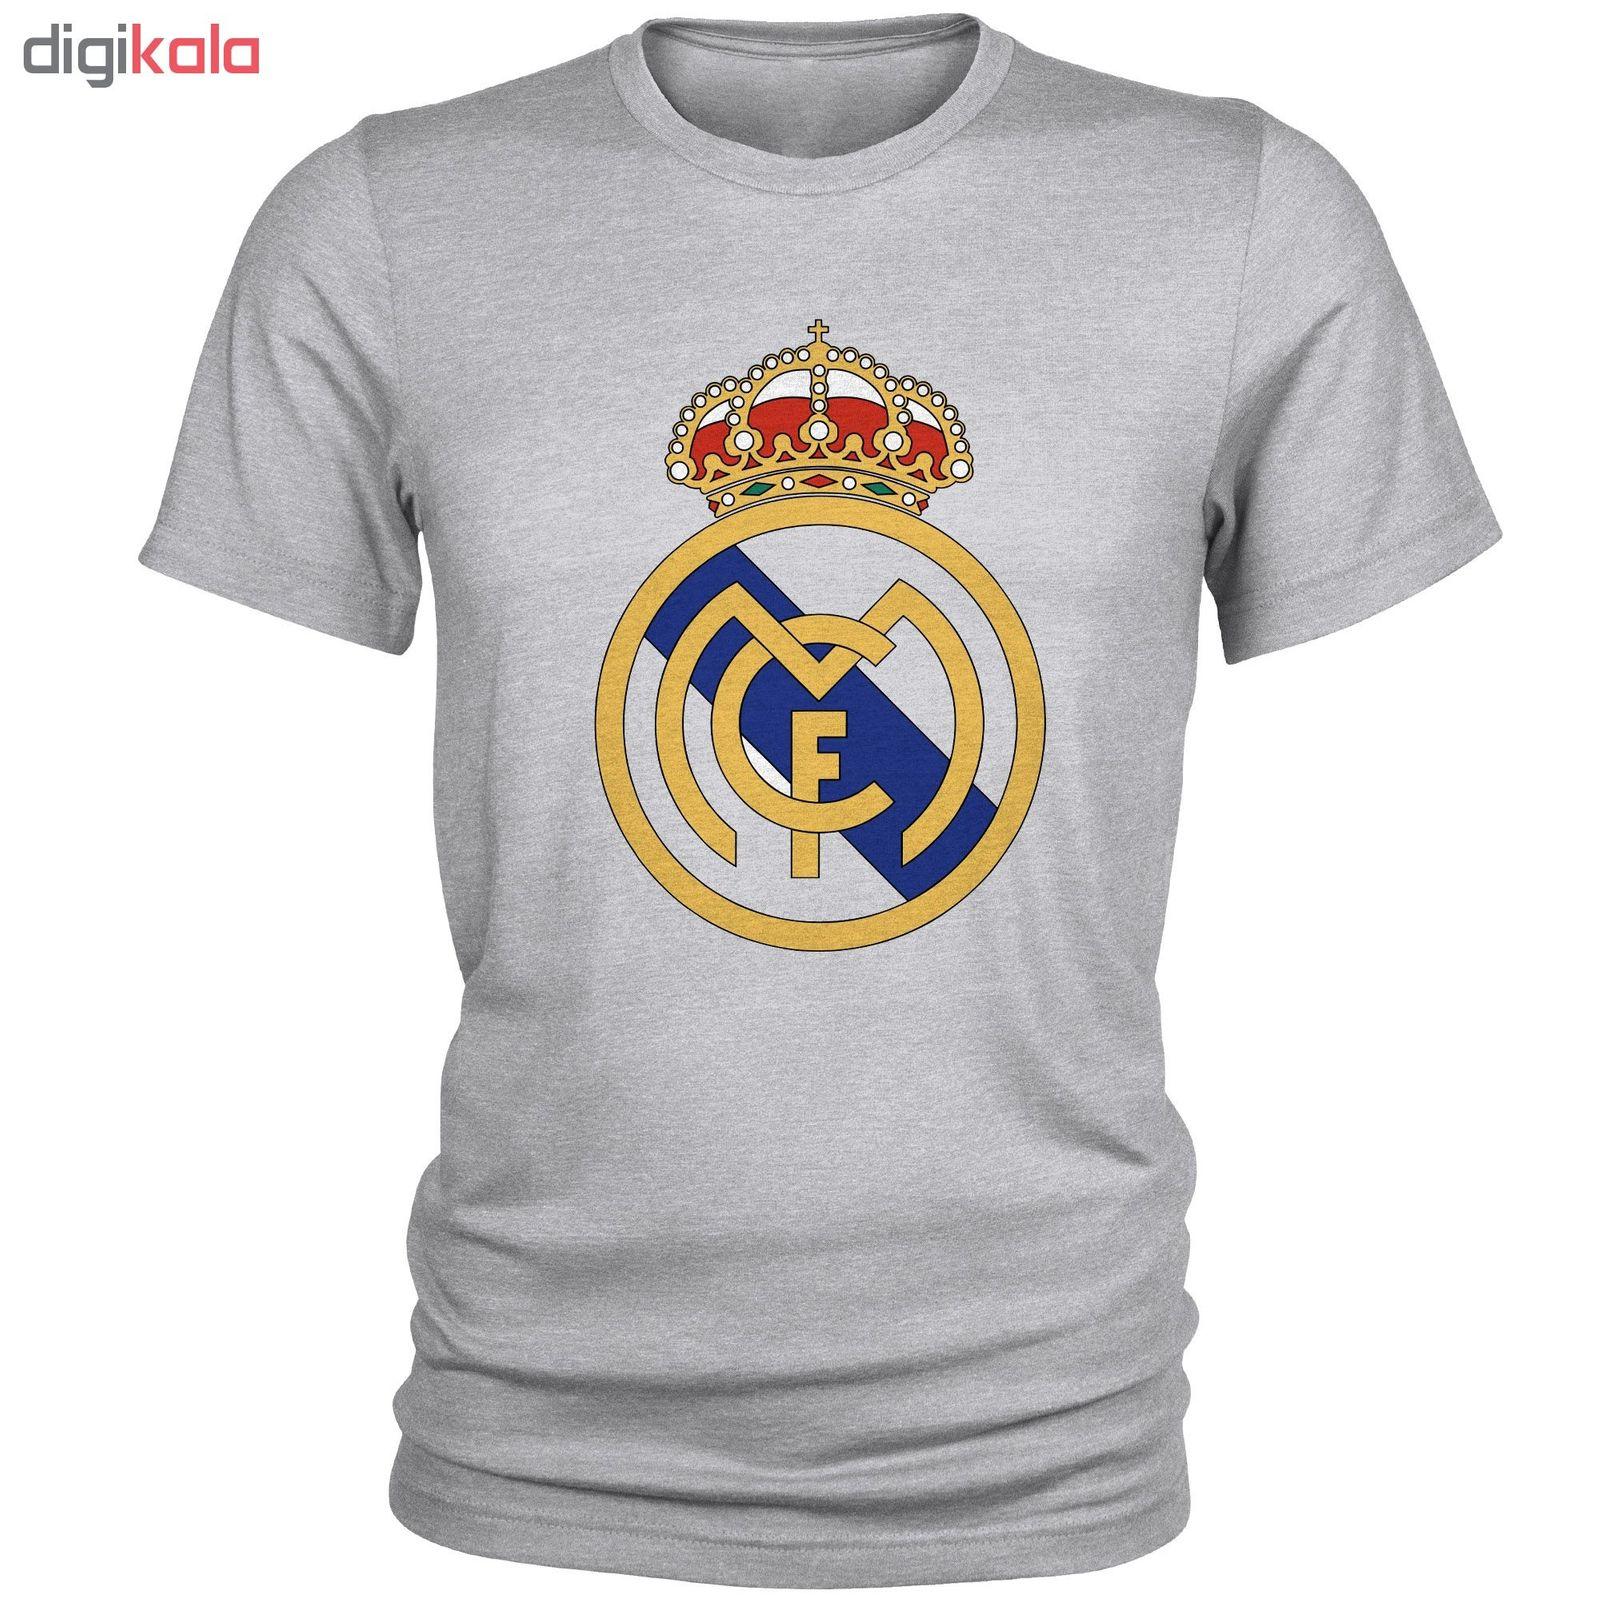 تی شرت مردانه طرح رئال مادرید کد S66 main 1 1